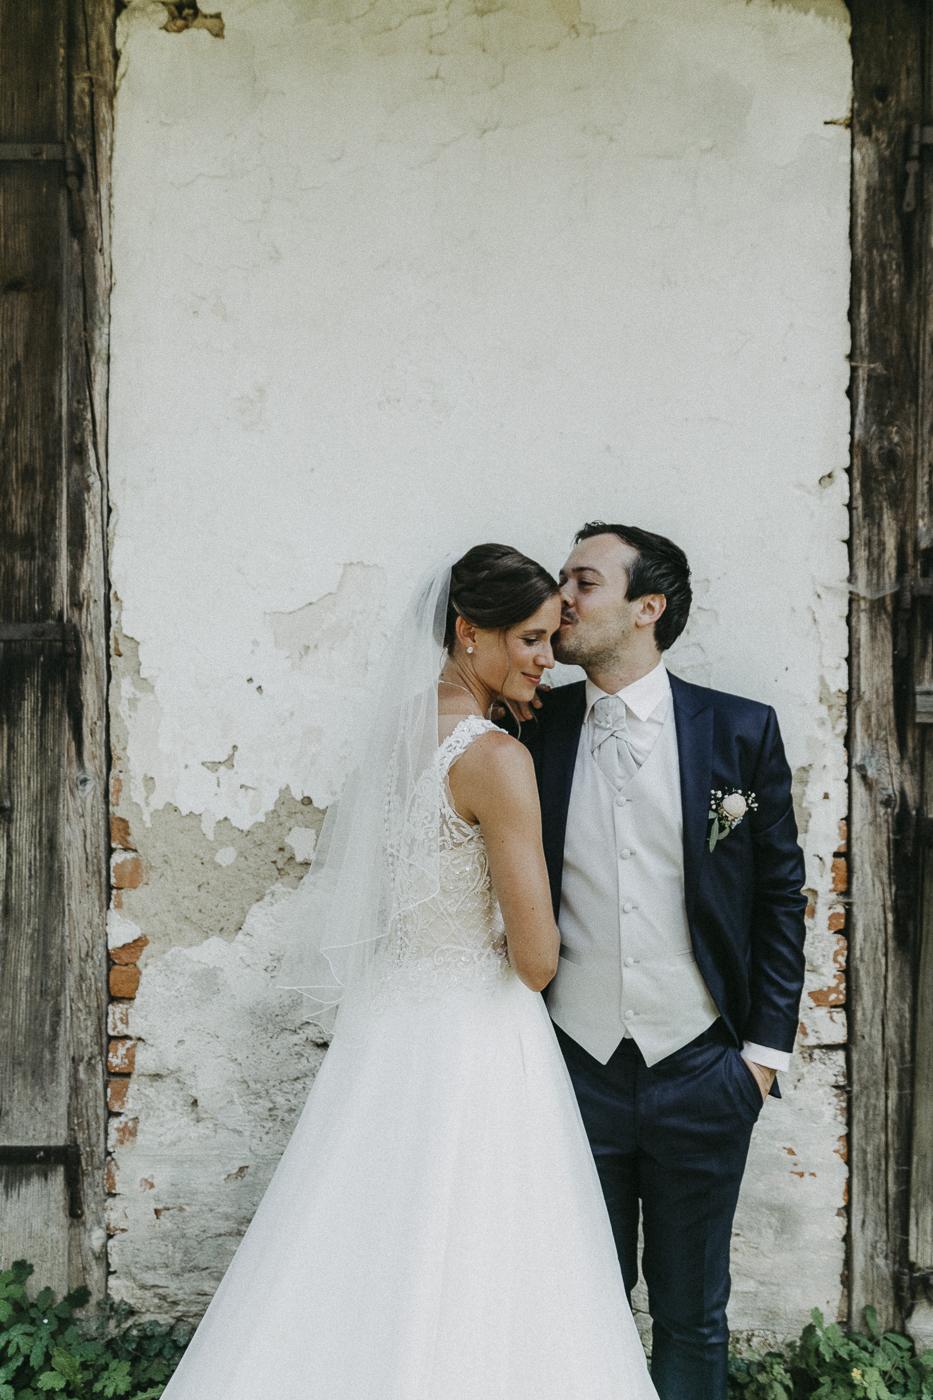 rosemarrylemon_ND_Hochzeit_Hochzeitsplanung9.jpg